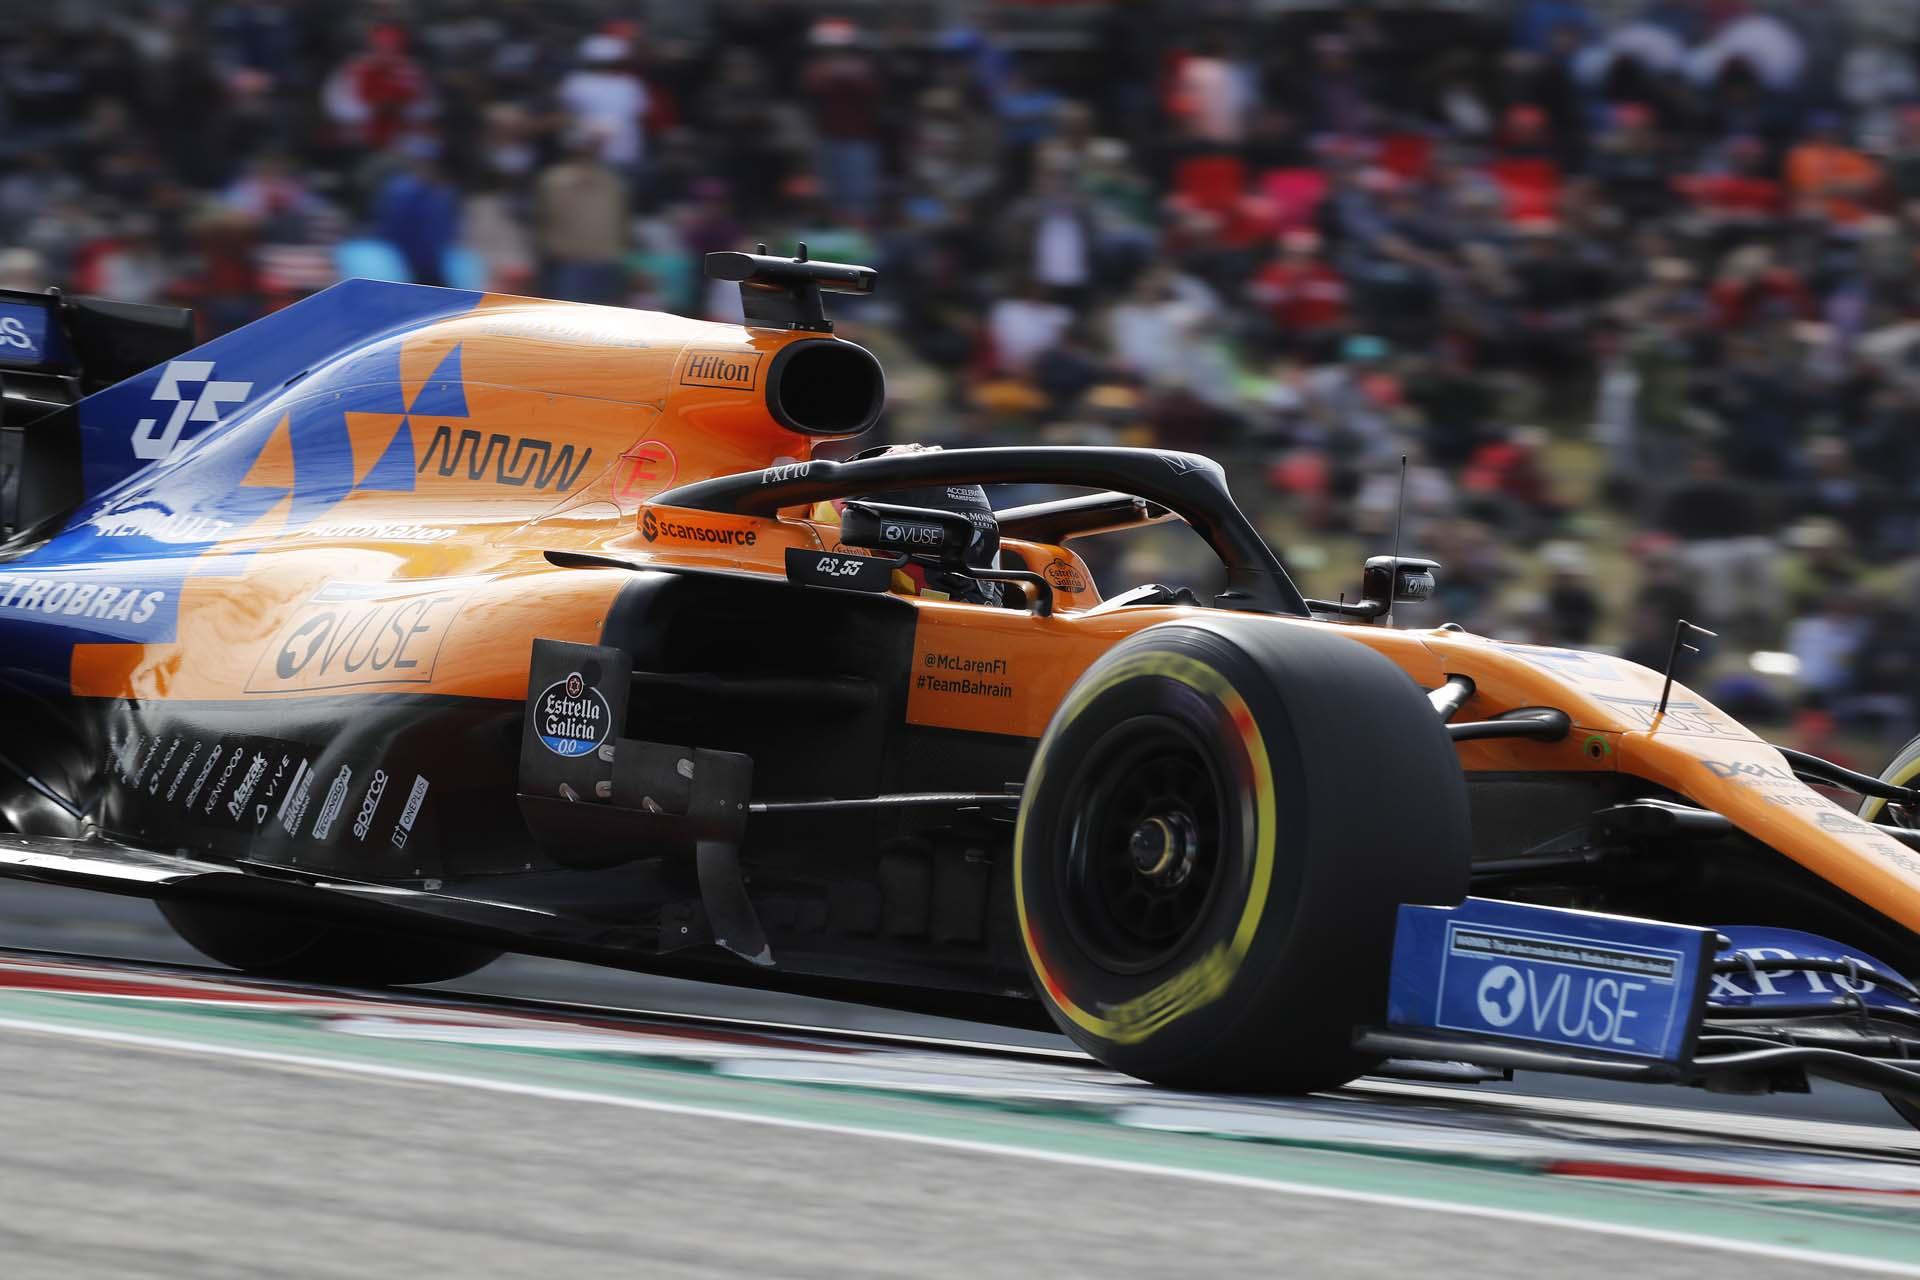 Carlos Sainz, McLaren MCL34, on a turn